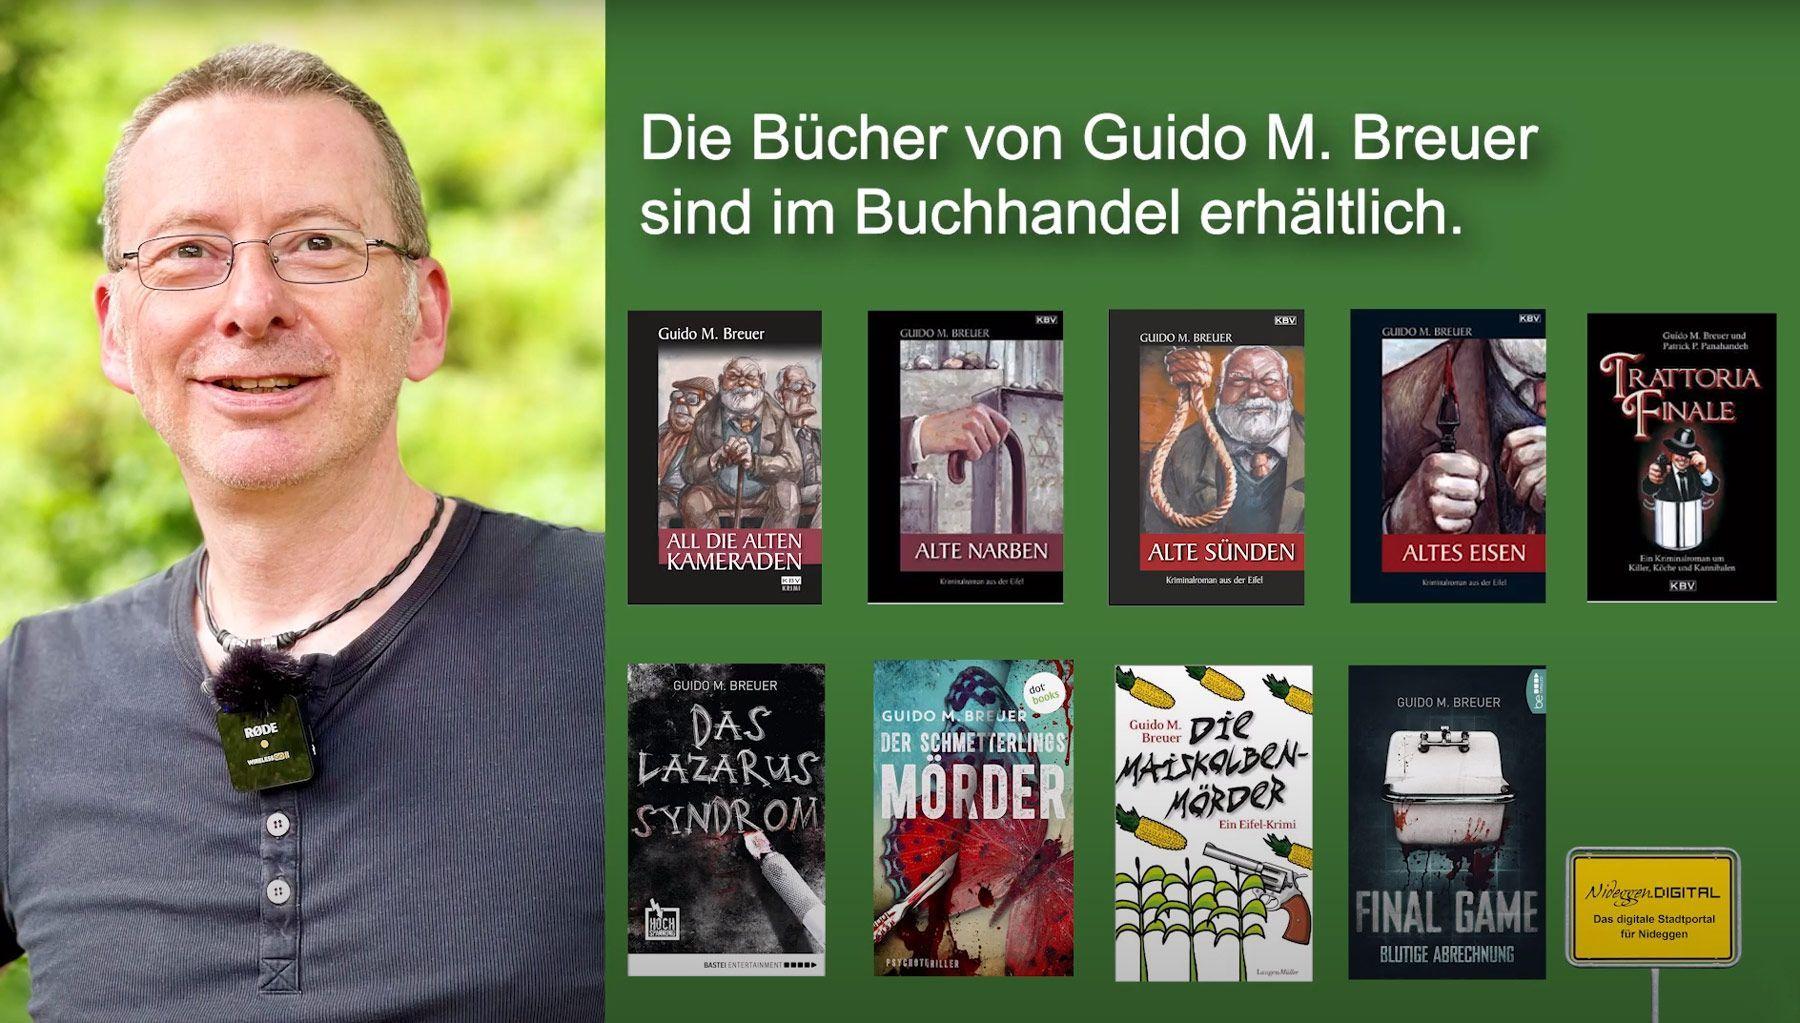 Kultur - Krimiautor Guido M. Breuer